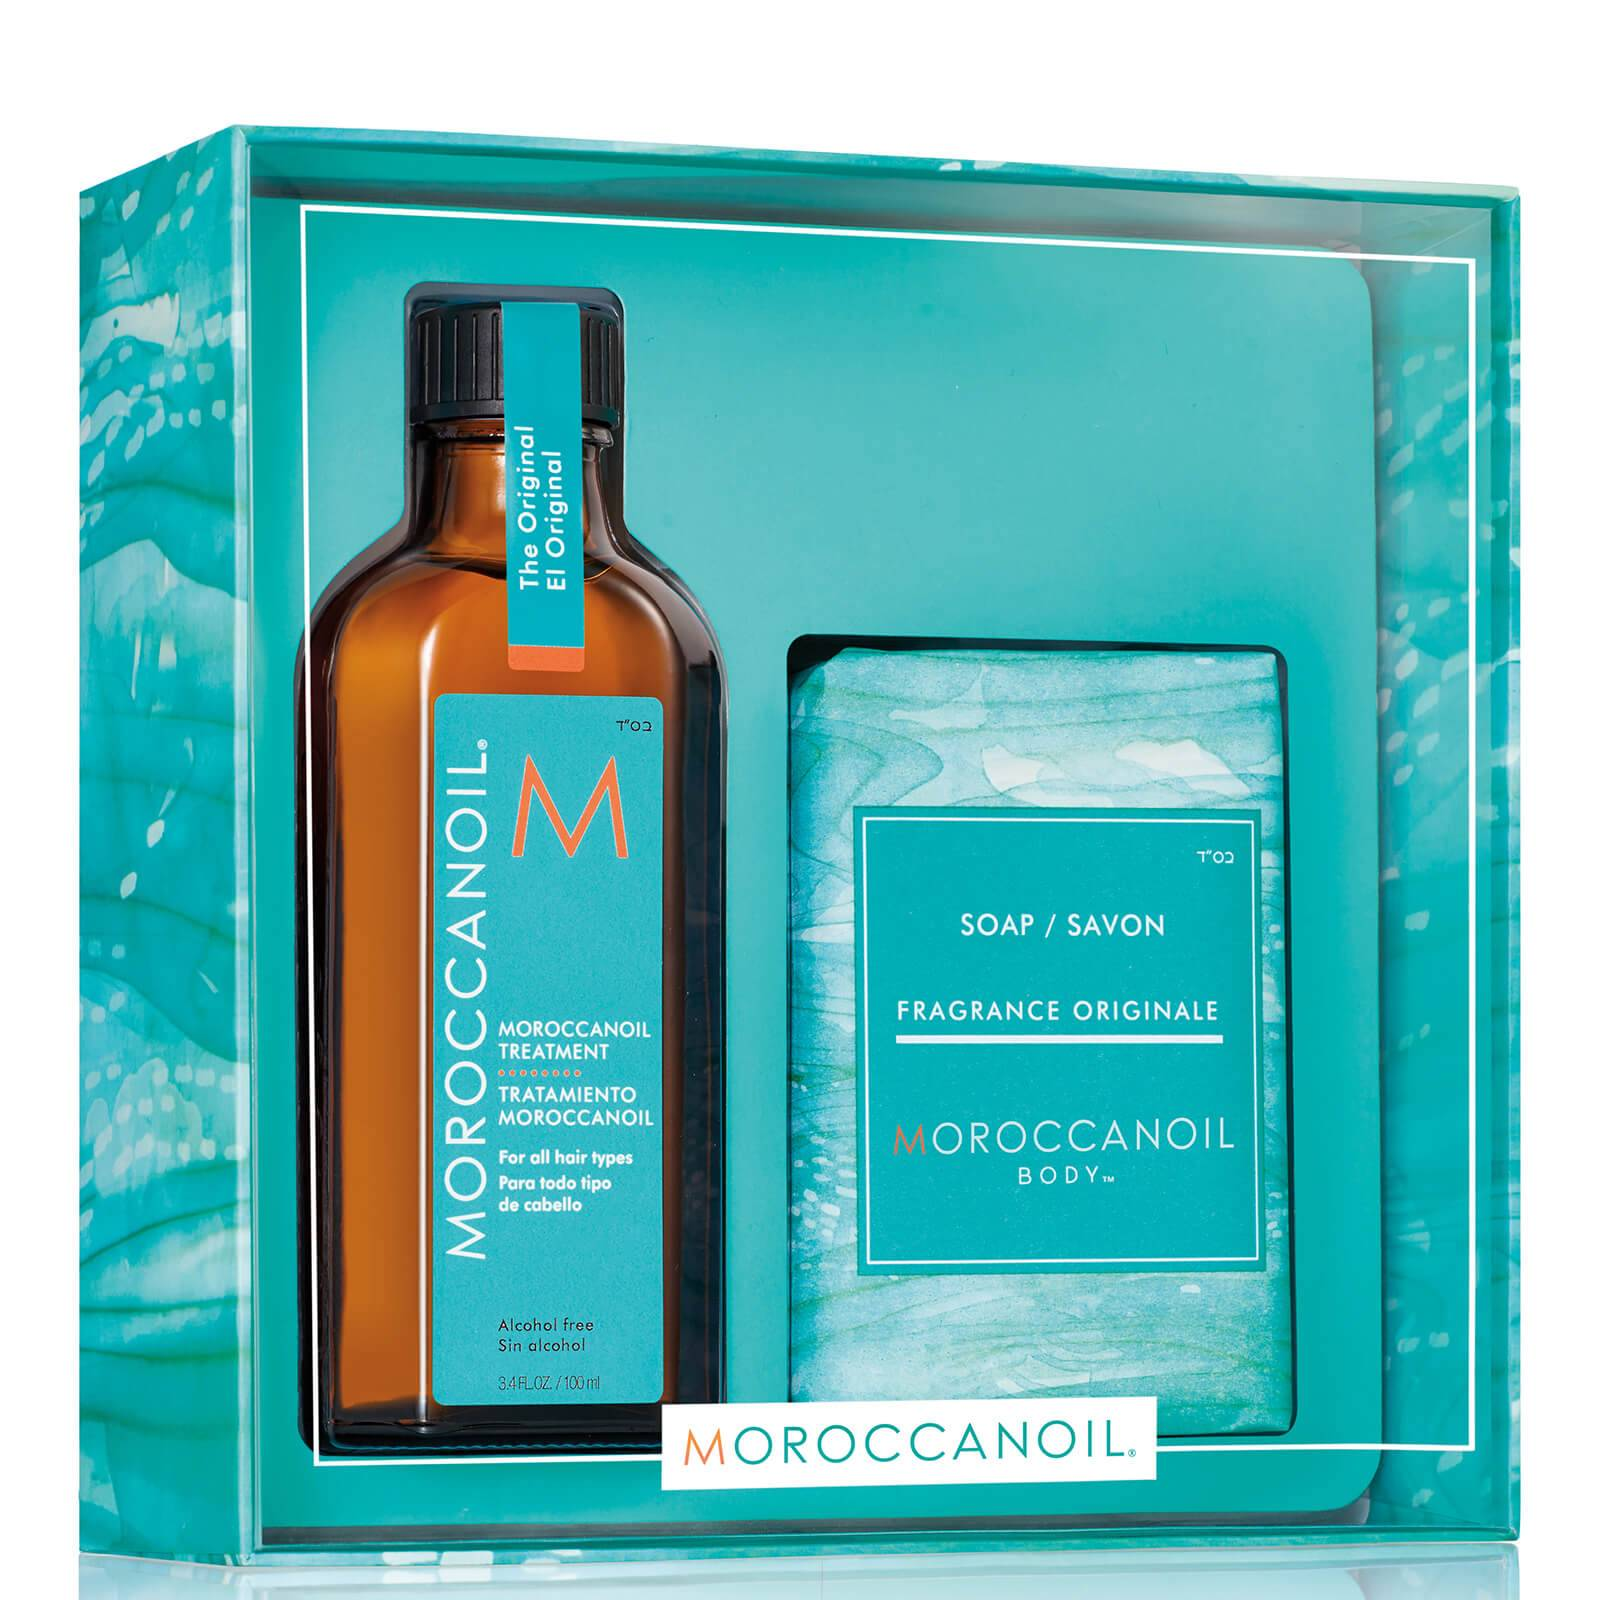 Moroccanoil Simply Beautiful Gift Set - Treatment Original (Worth £45.45)